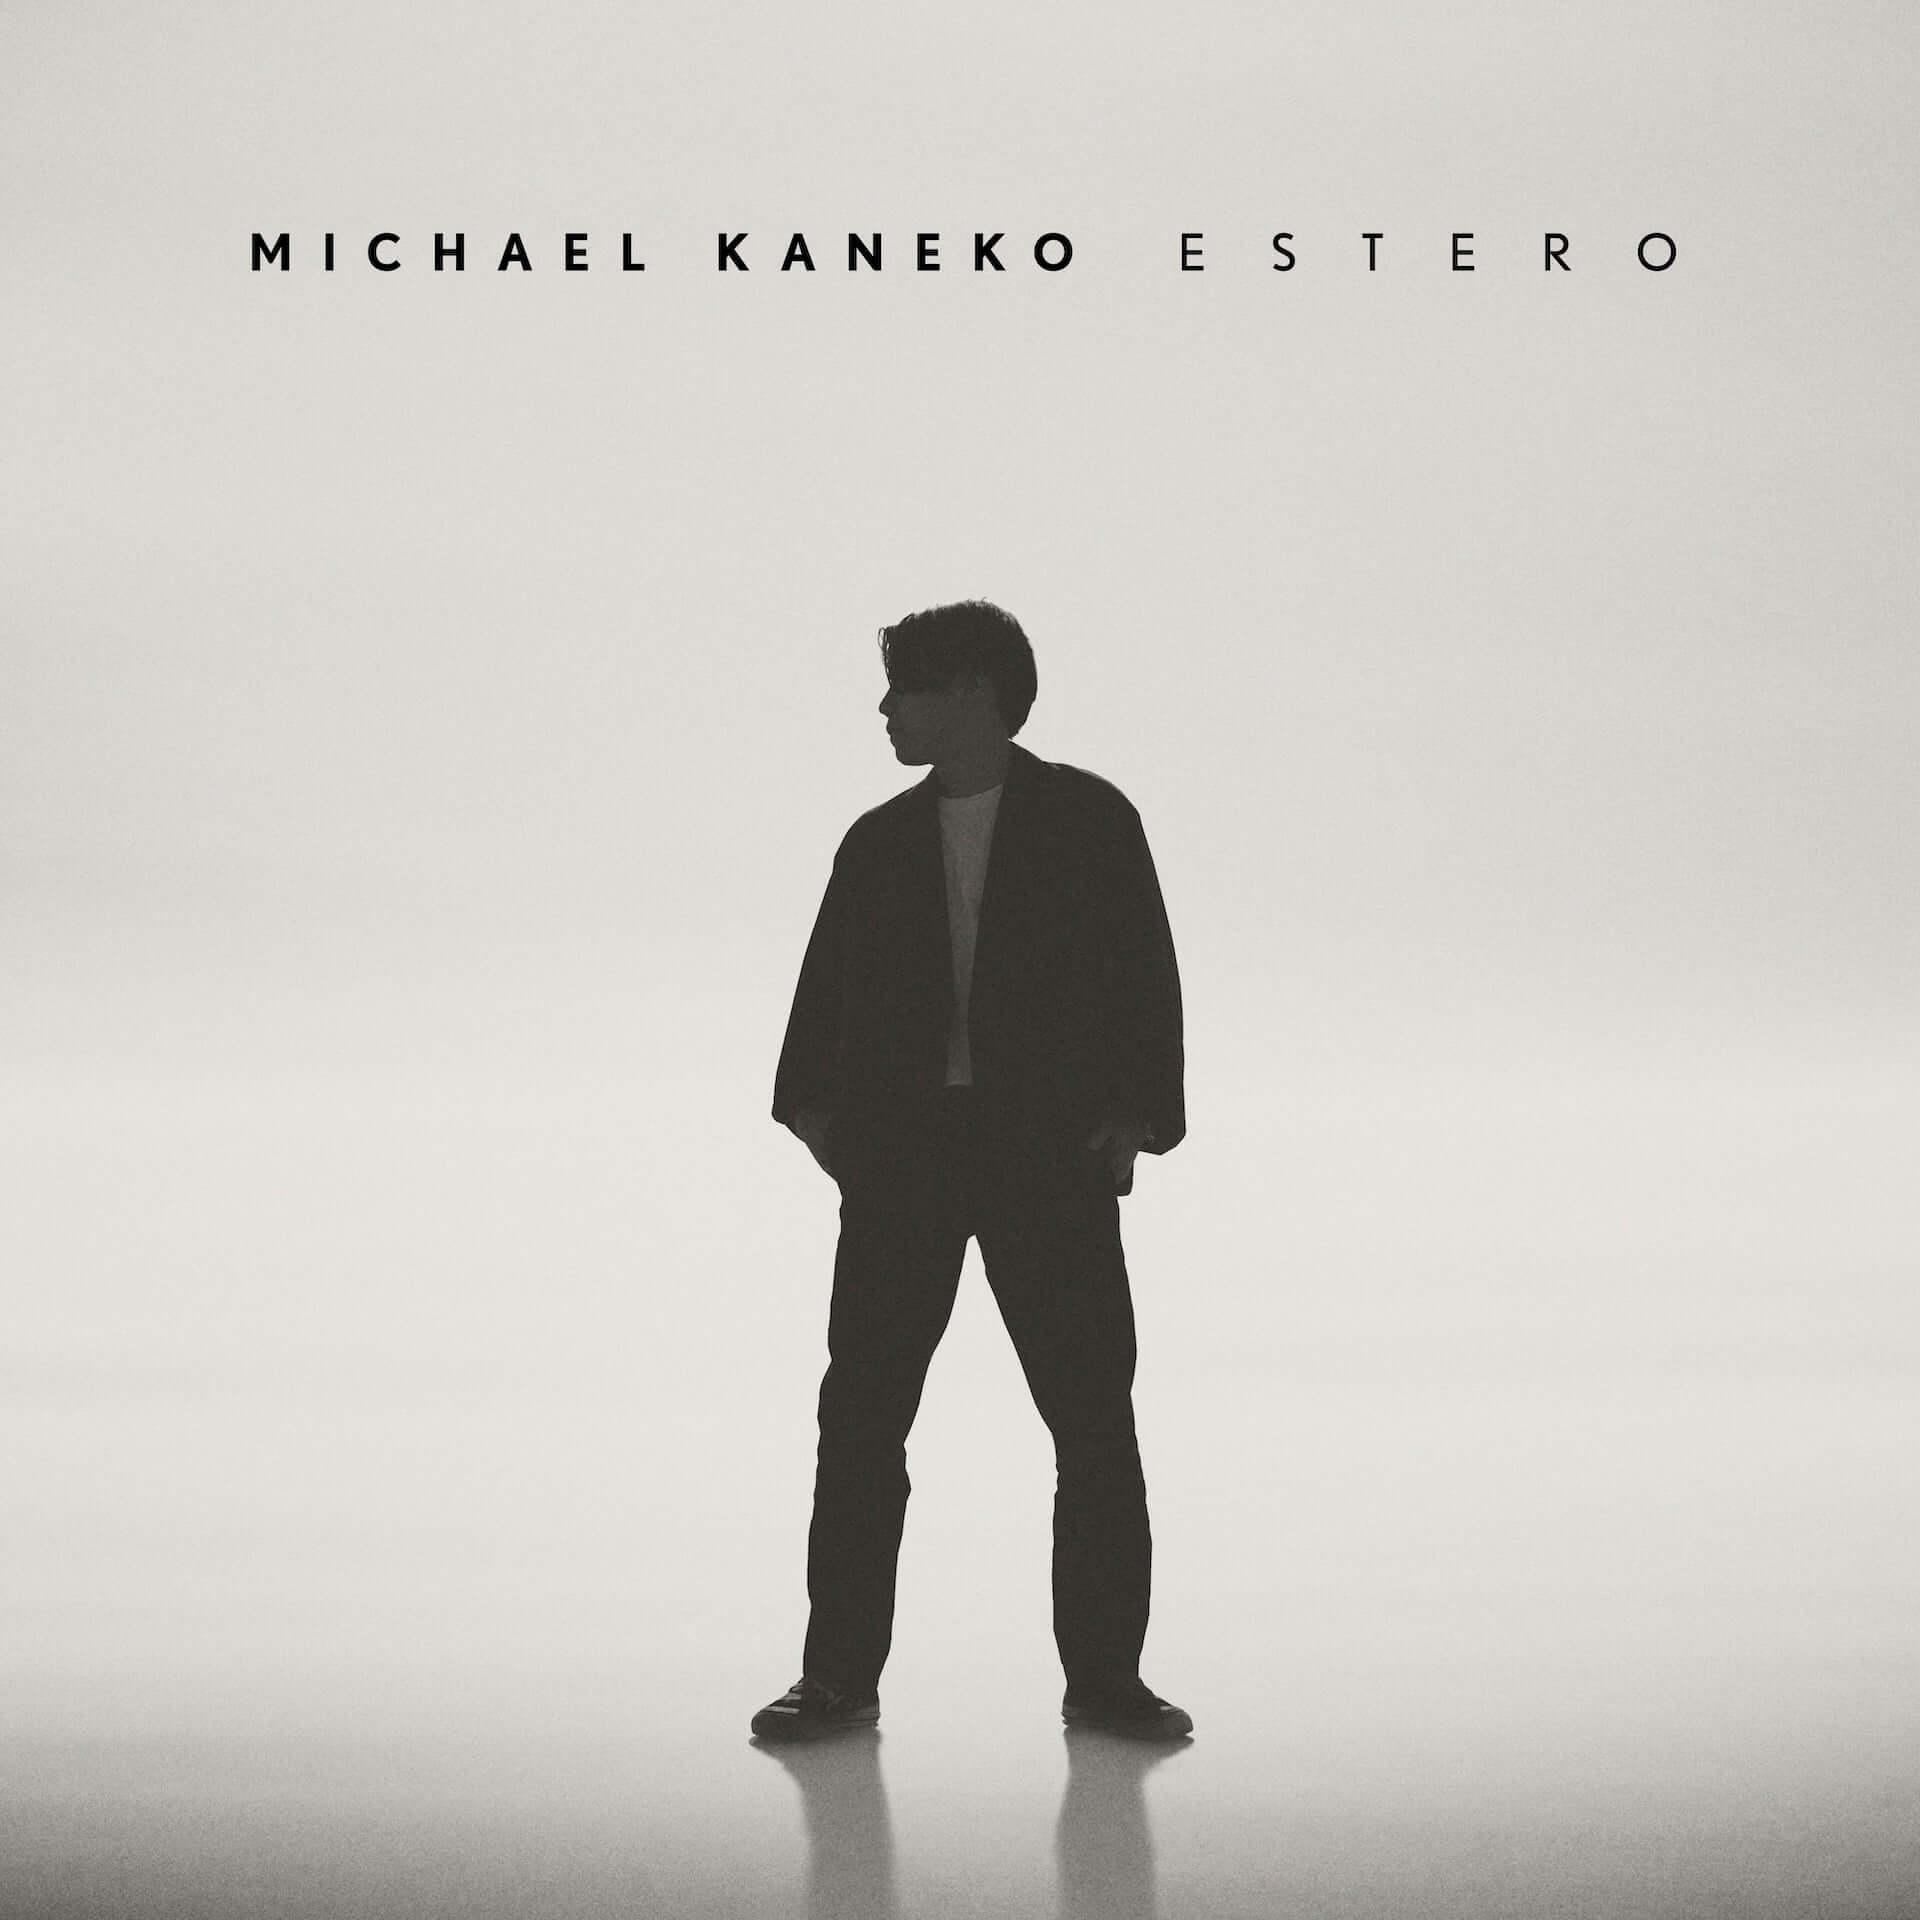 Michael KanekoがDaichi Yamamoto、Hiro-a-keyを迎えた1stアルバム『ESTERO』をリリース決定!限定版CDには弾き語りカバーEPも付属 music200716_michaelkaneko_2-1920x1920